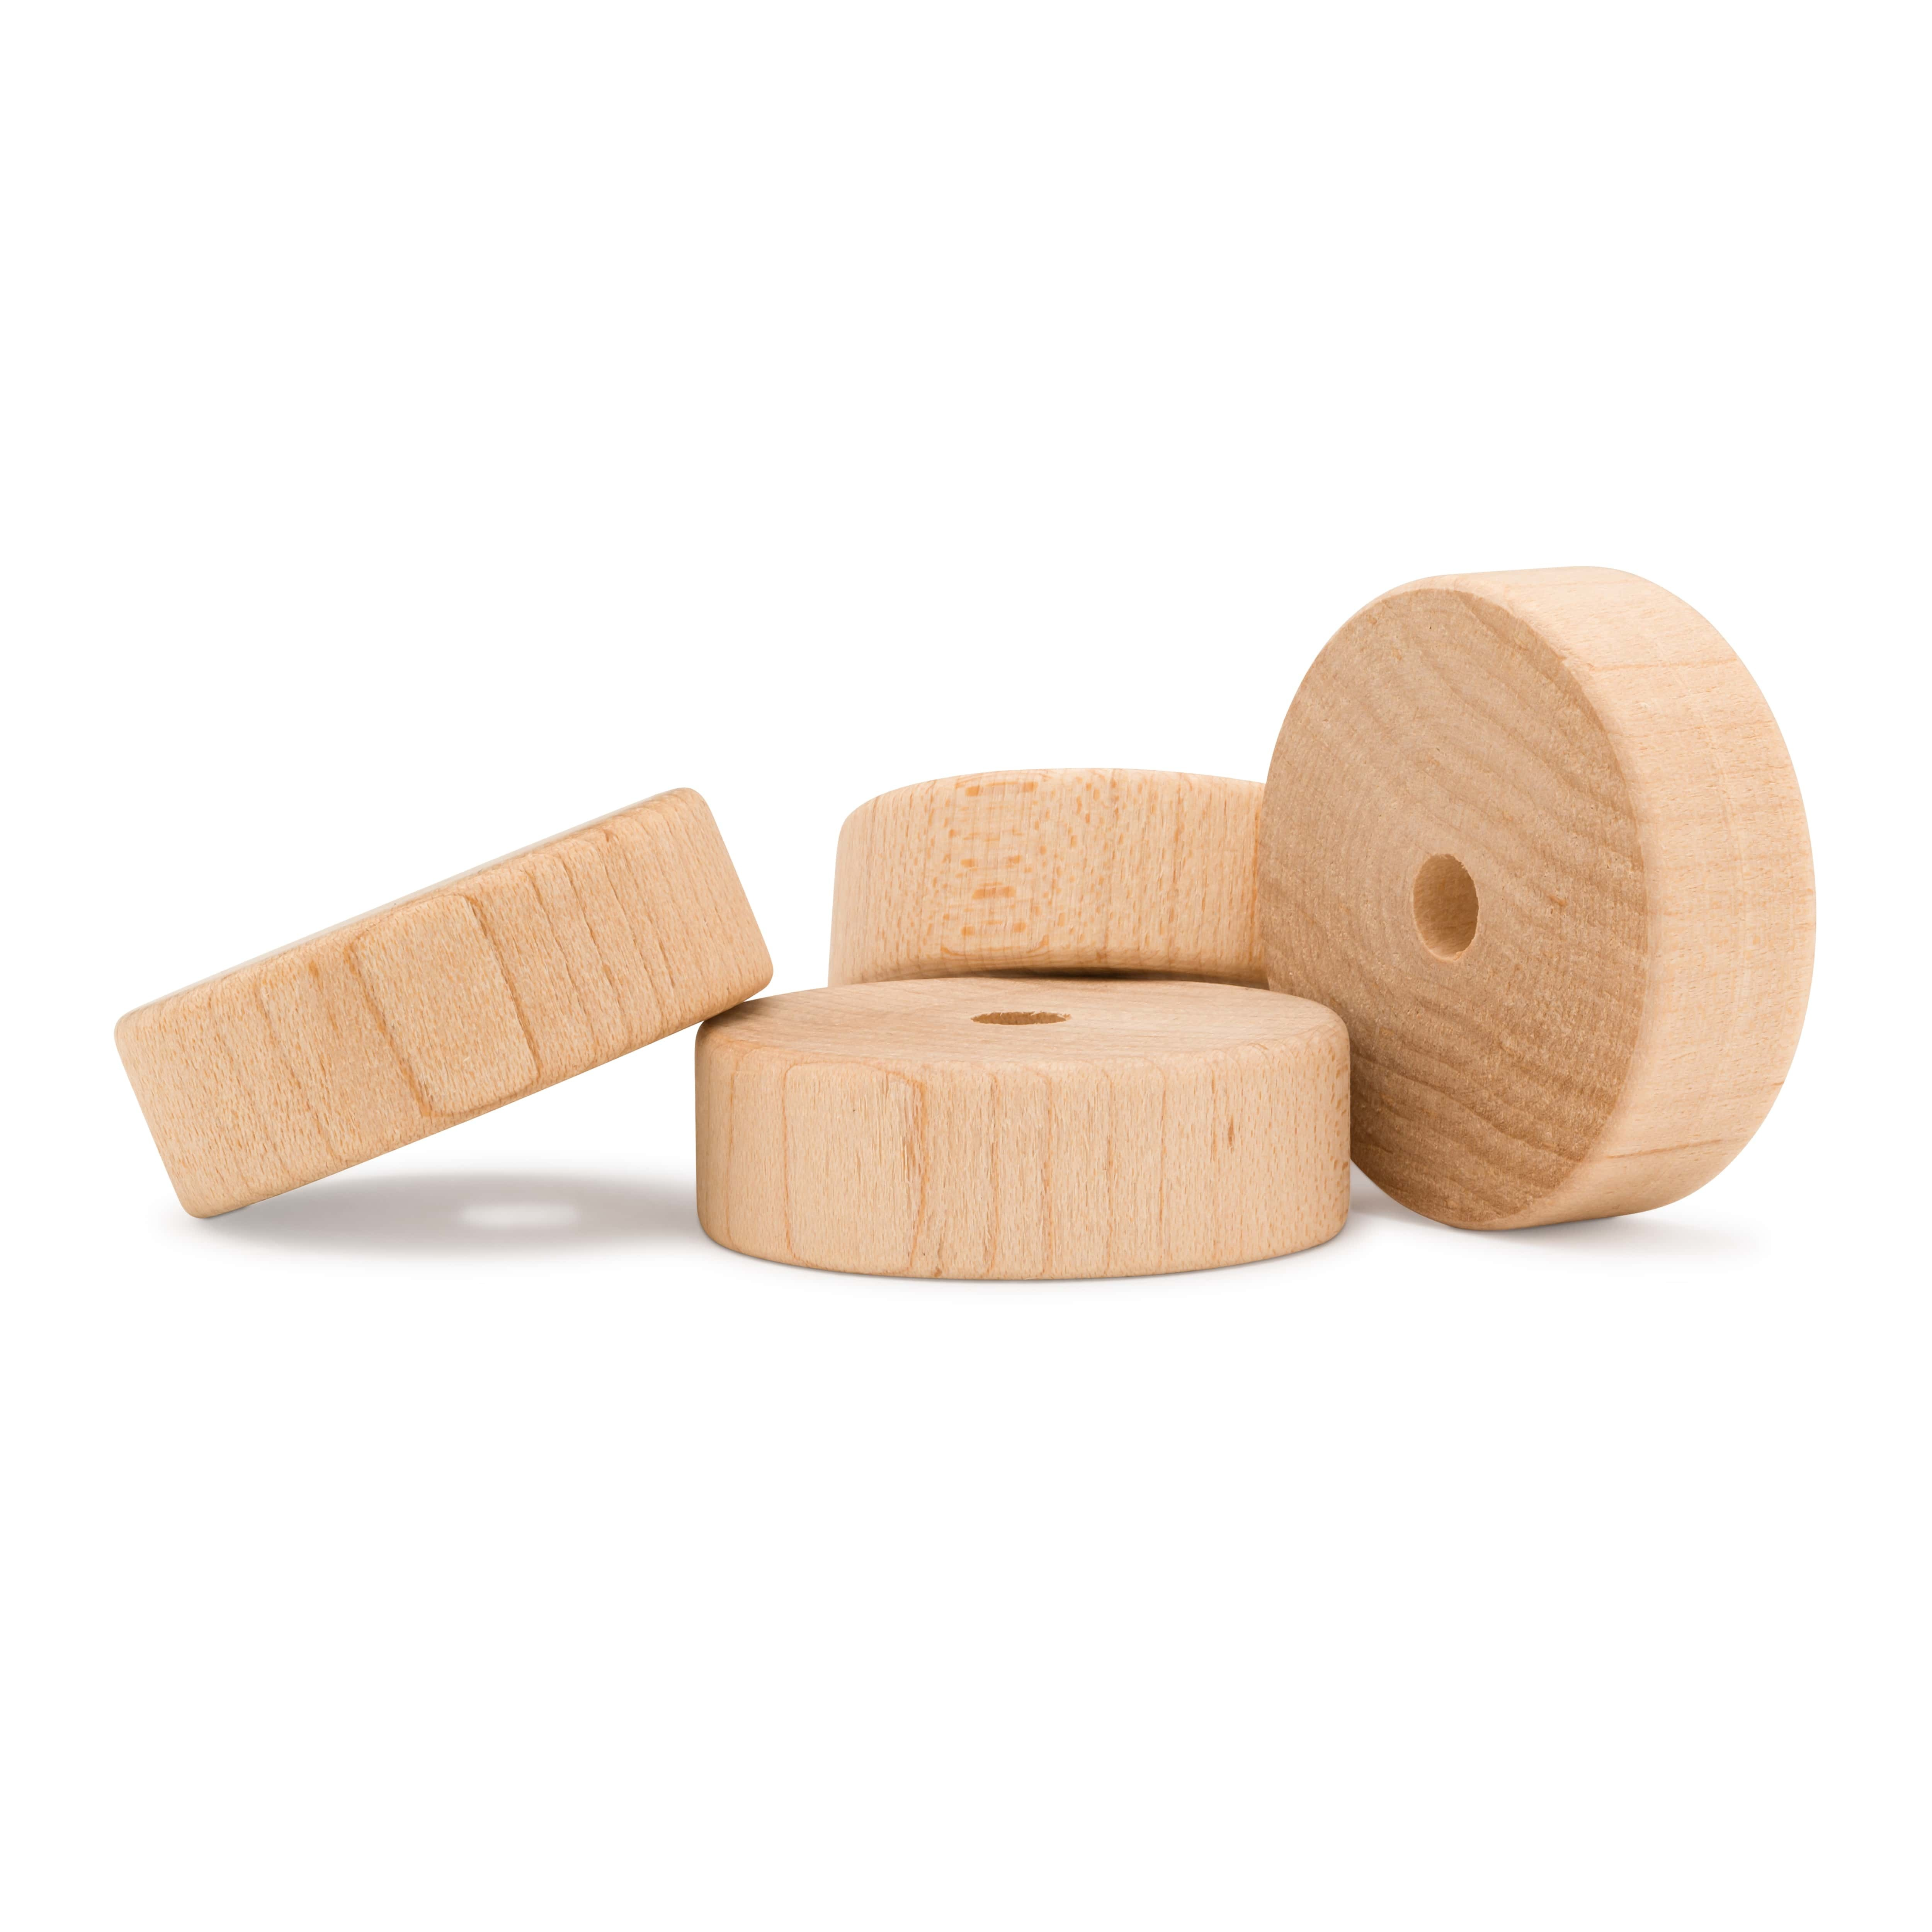 Wooden Slab Wheels